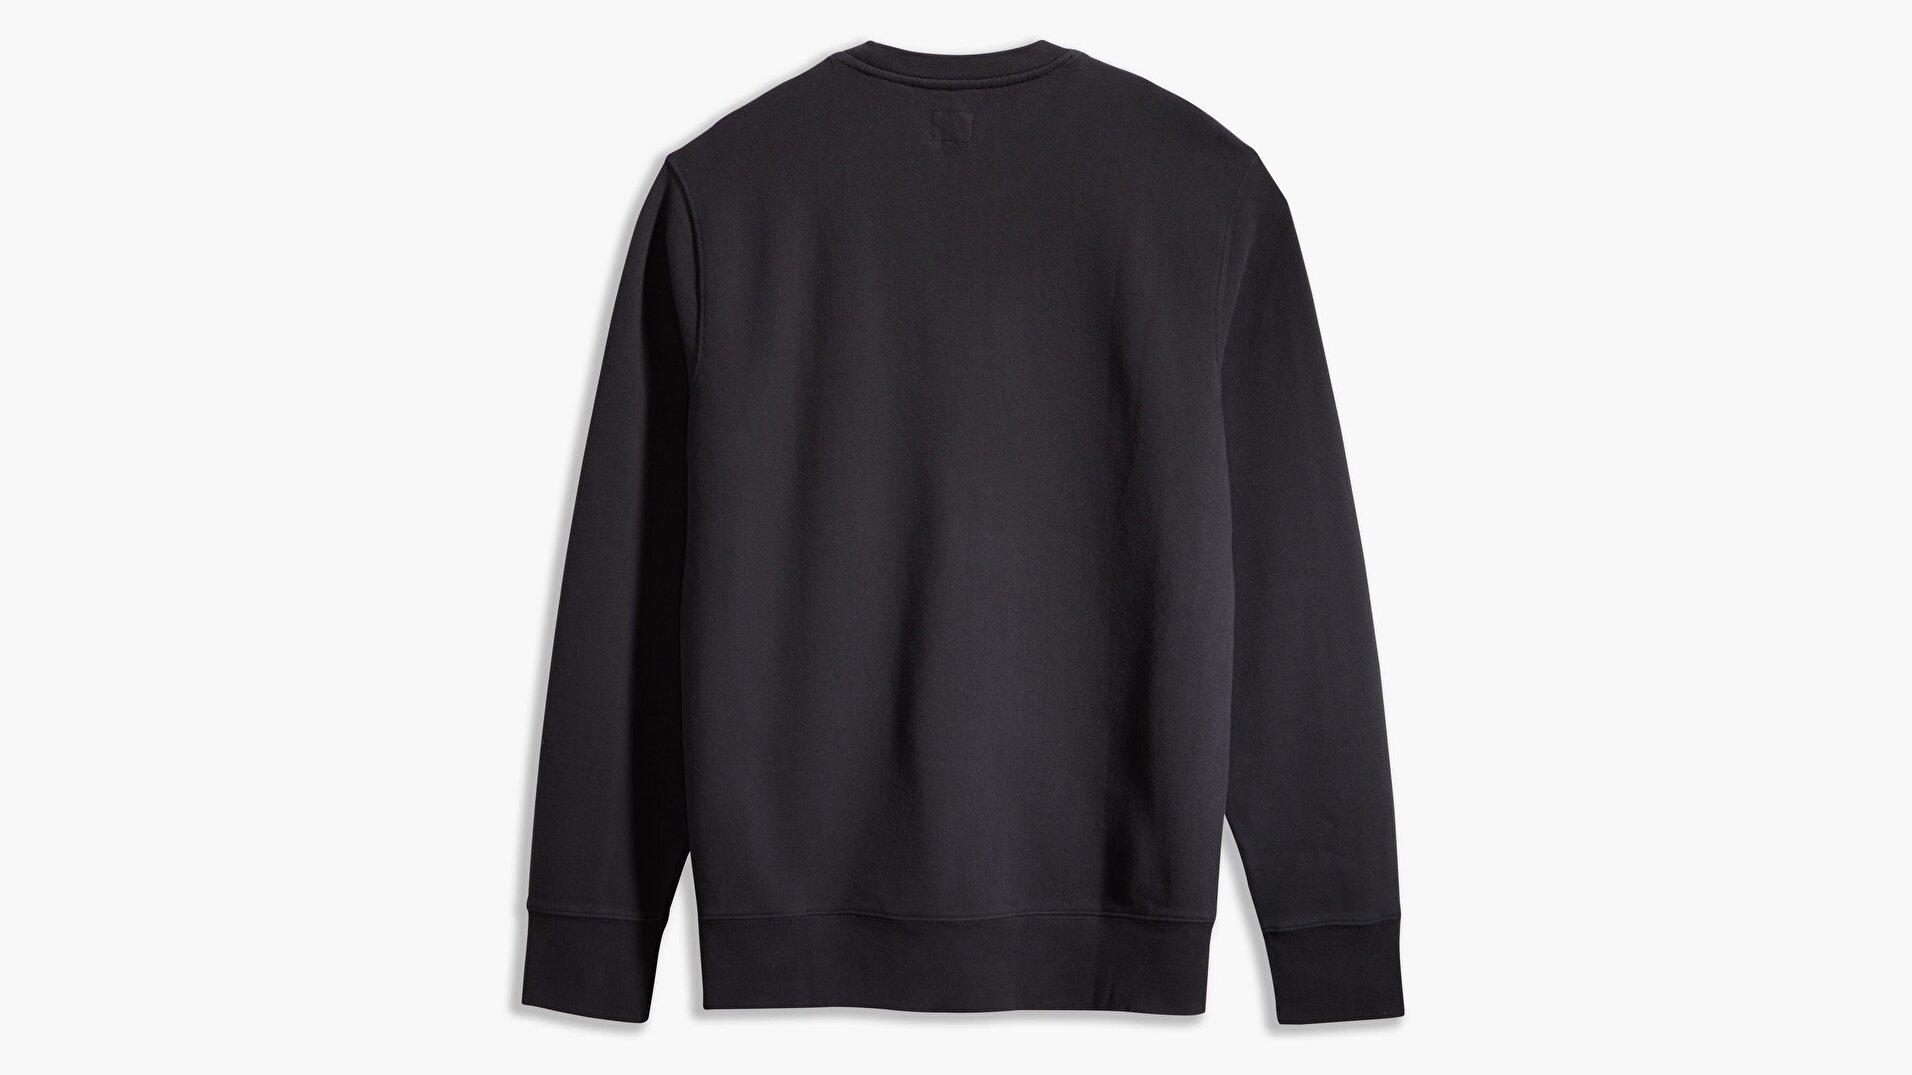 New Original Crew Siyah Erkek Sweatshirt